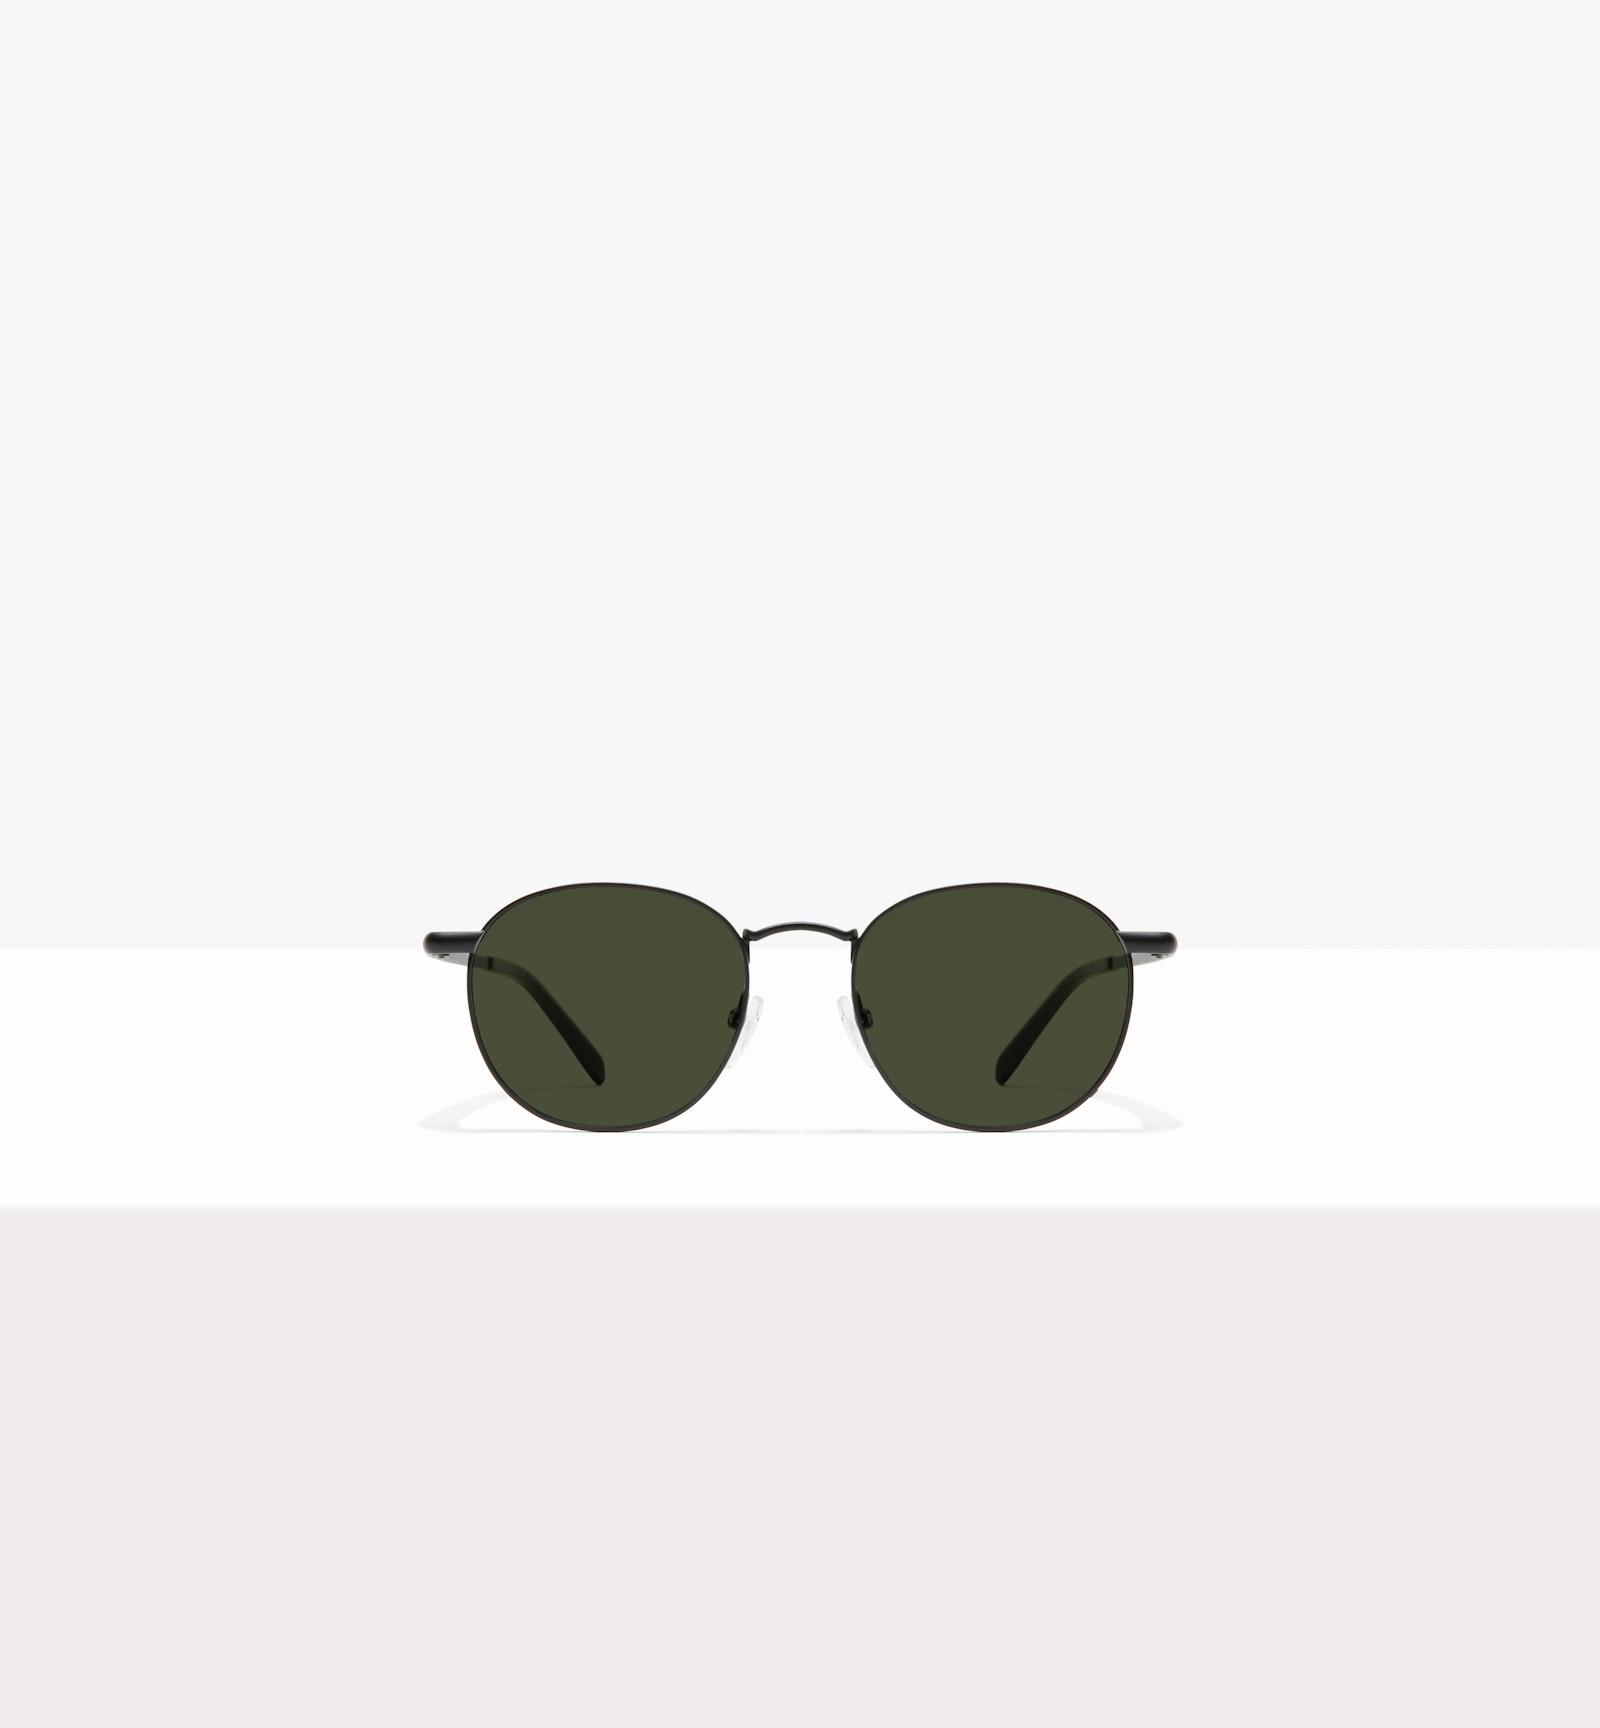 Affordable Fashion Glasses Round Sunglasses Men Women Divine Matte Black